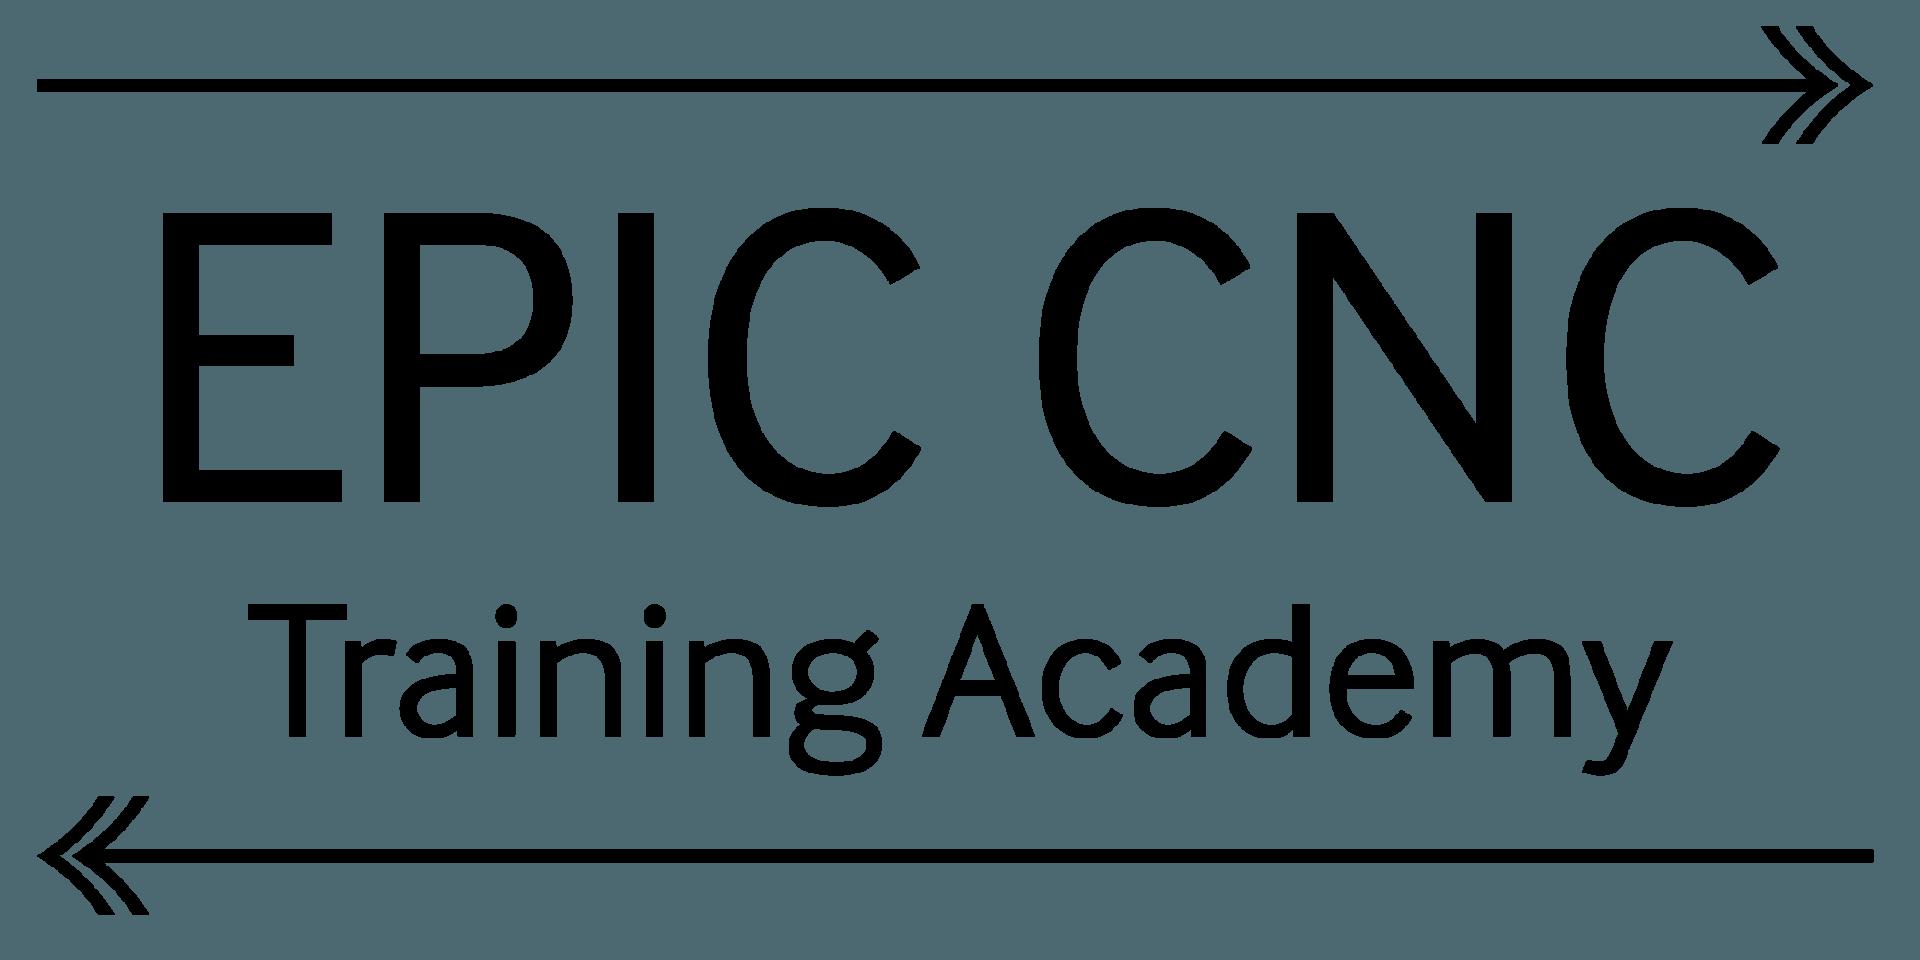 Epic CNC Training Academy - Fenton, MI